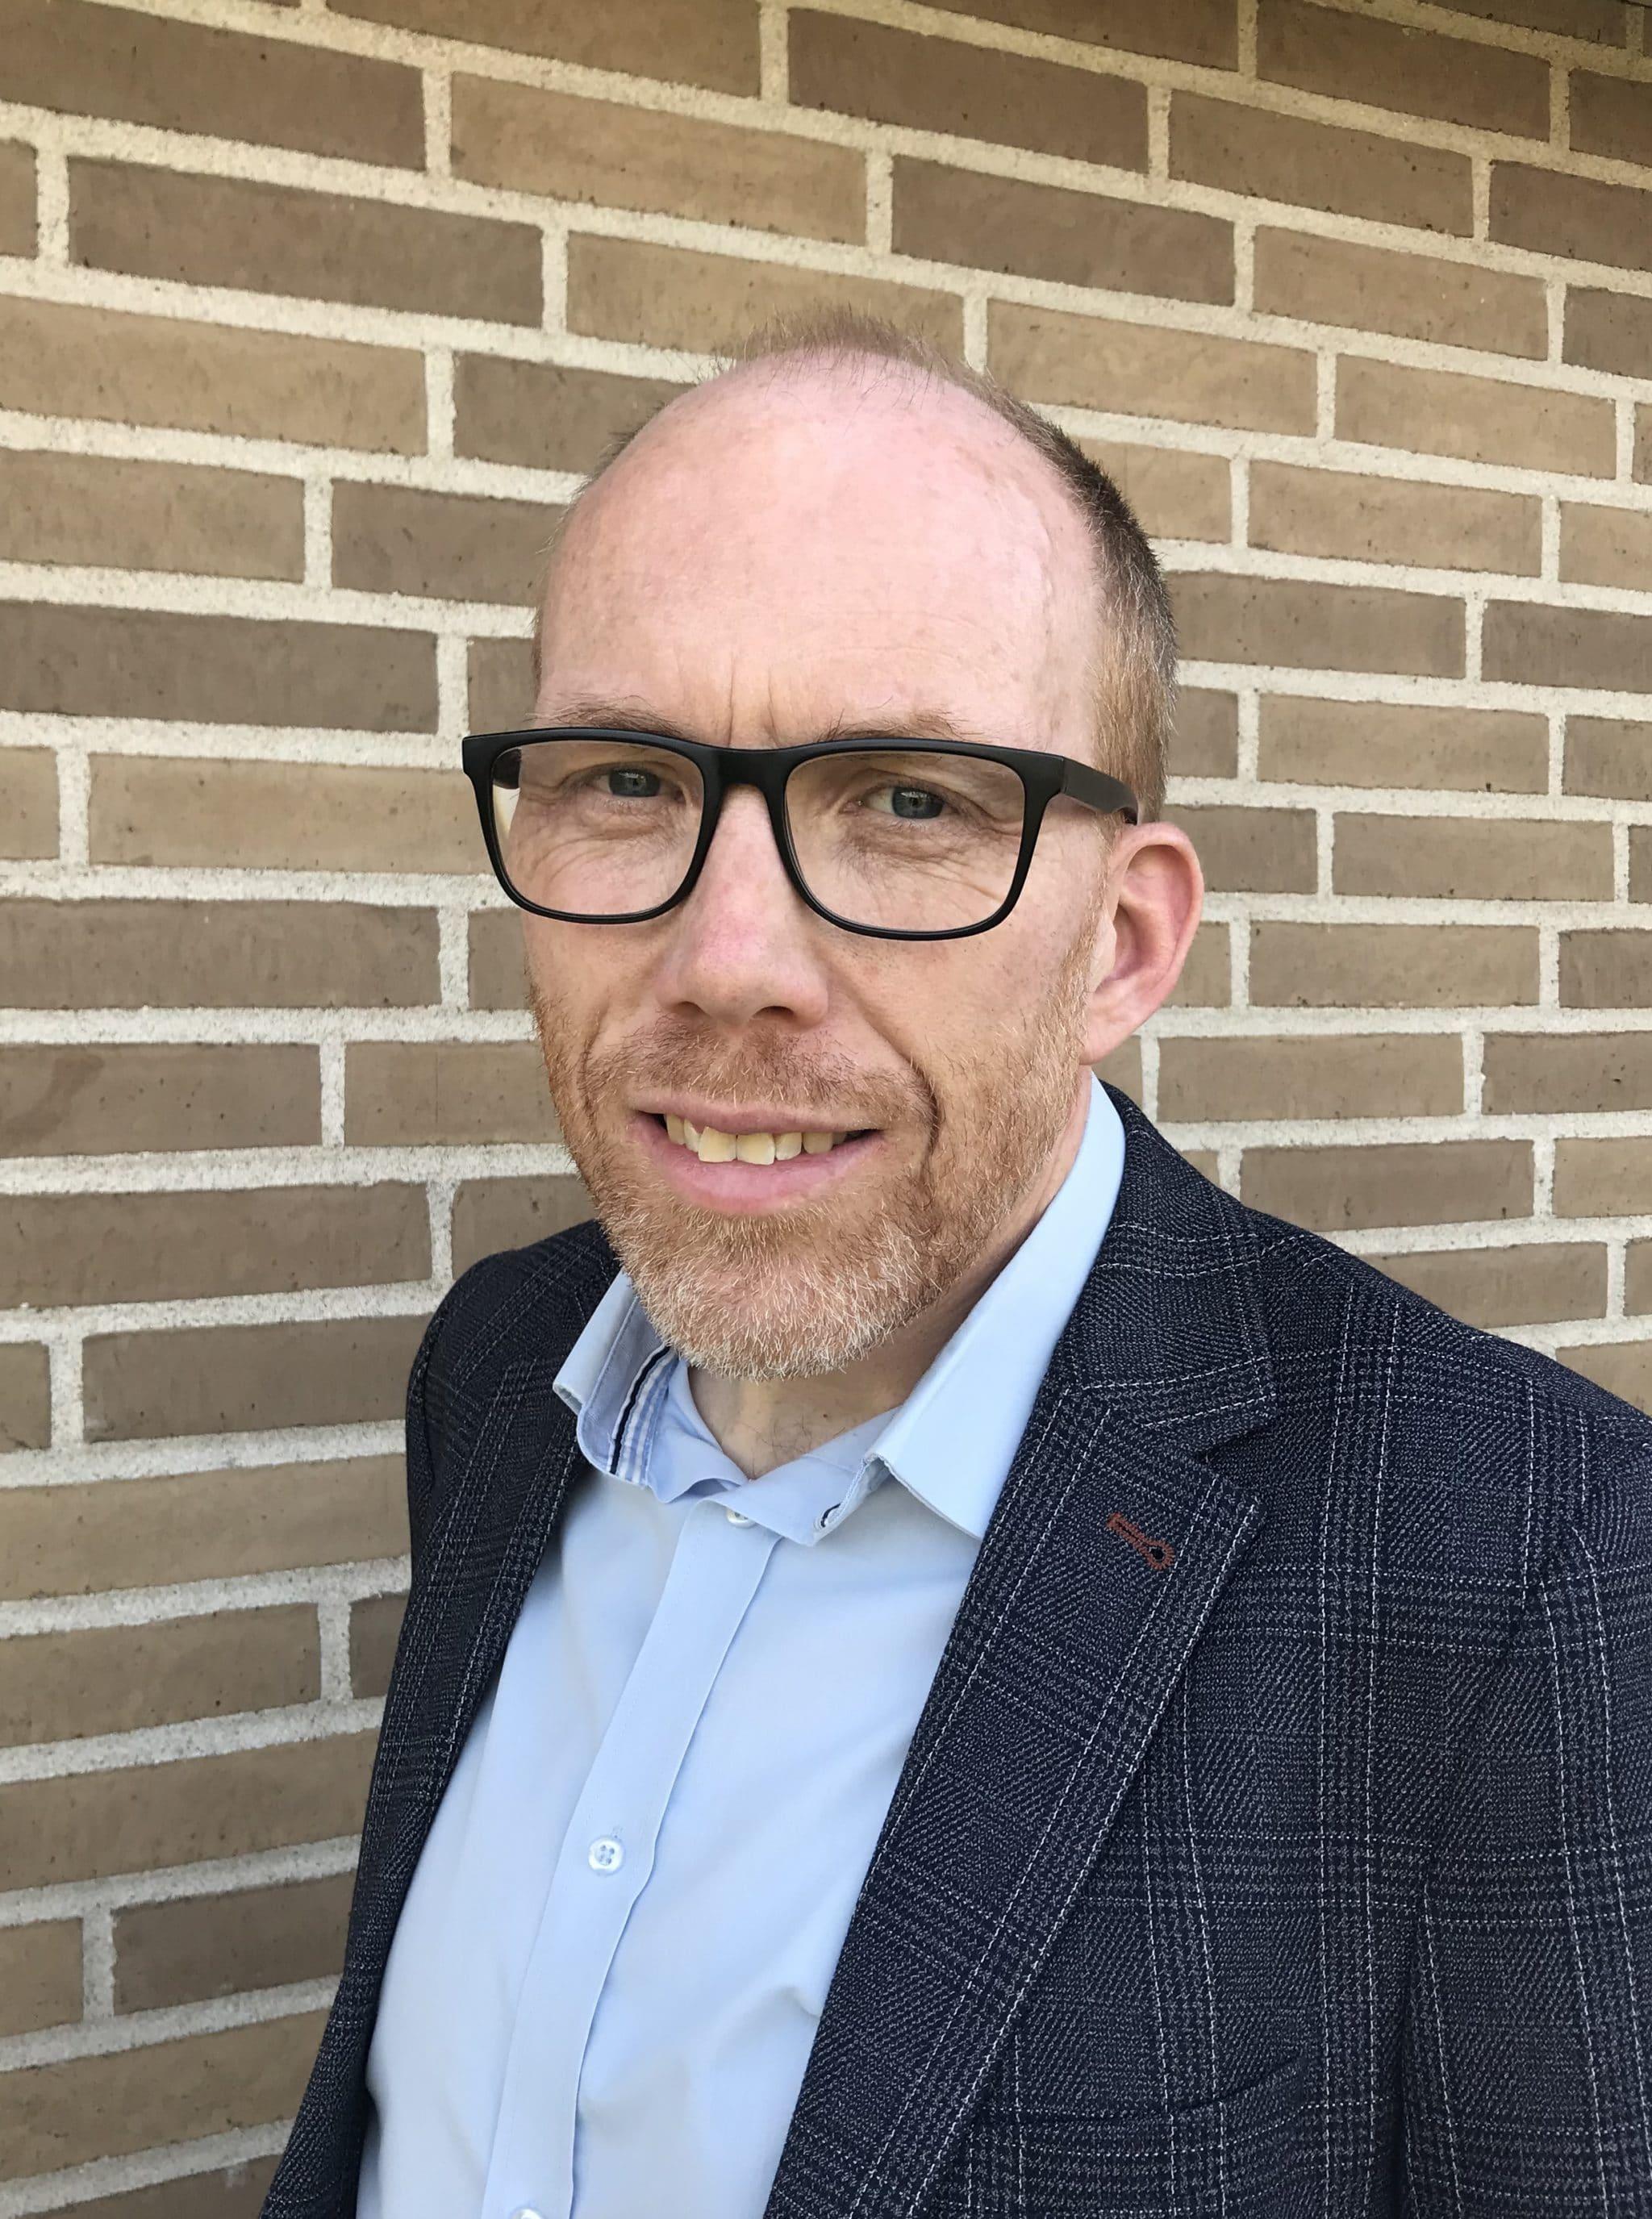 Allan Søvind Jensen